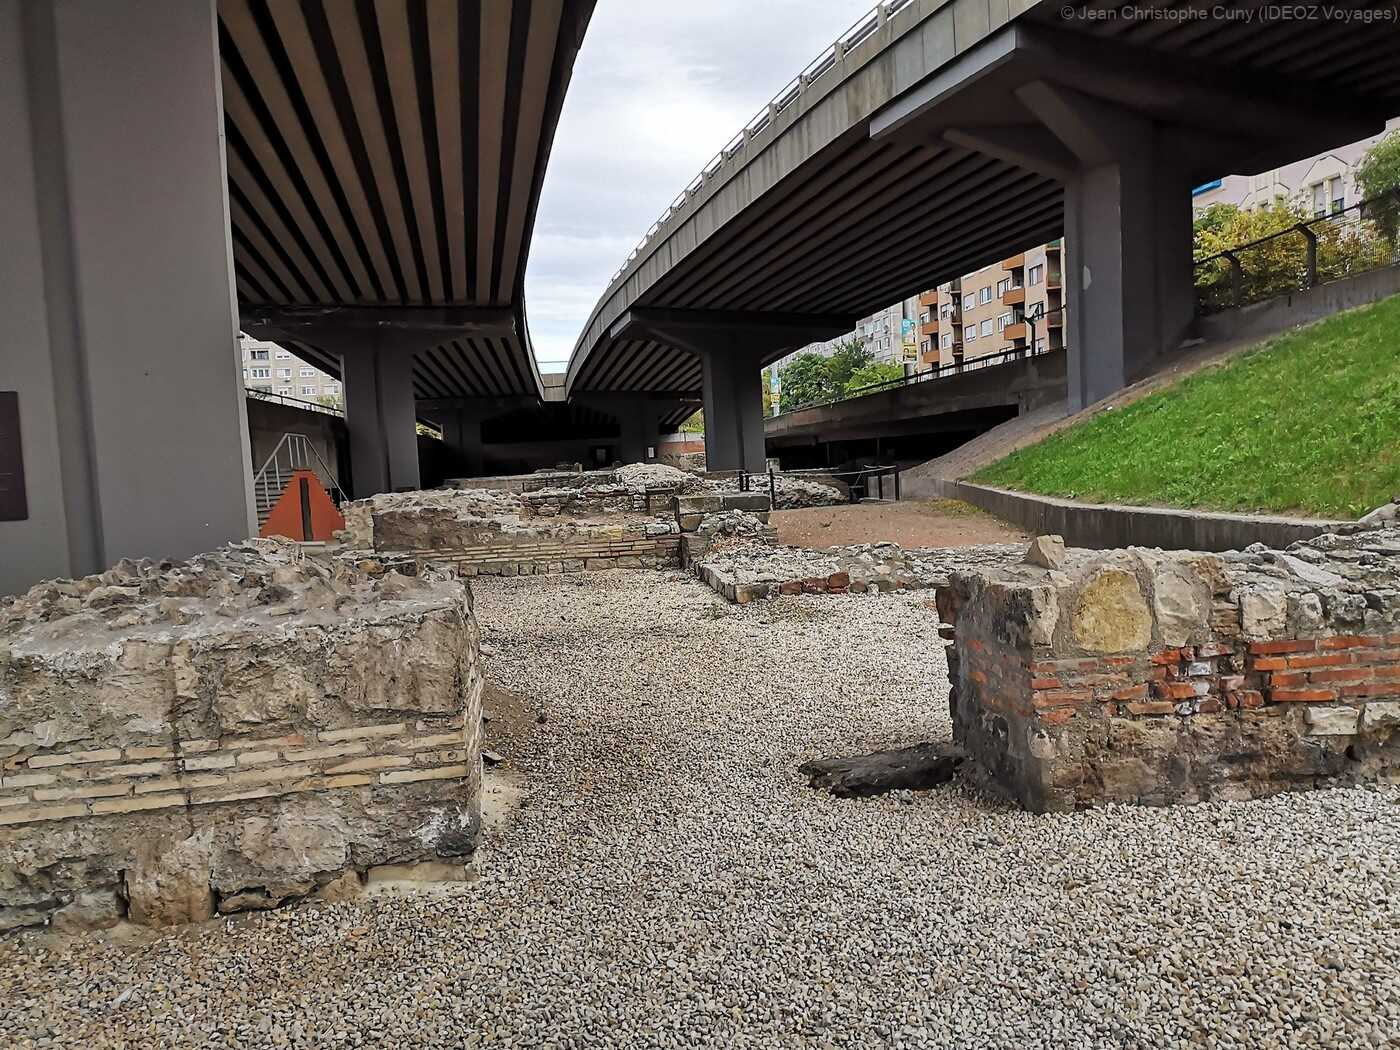 Óbuda ruines des thermes militaires à budapest